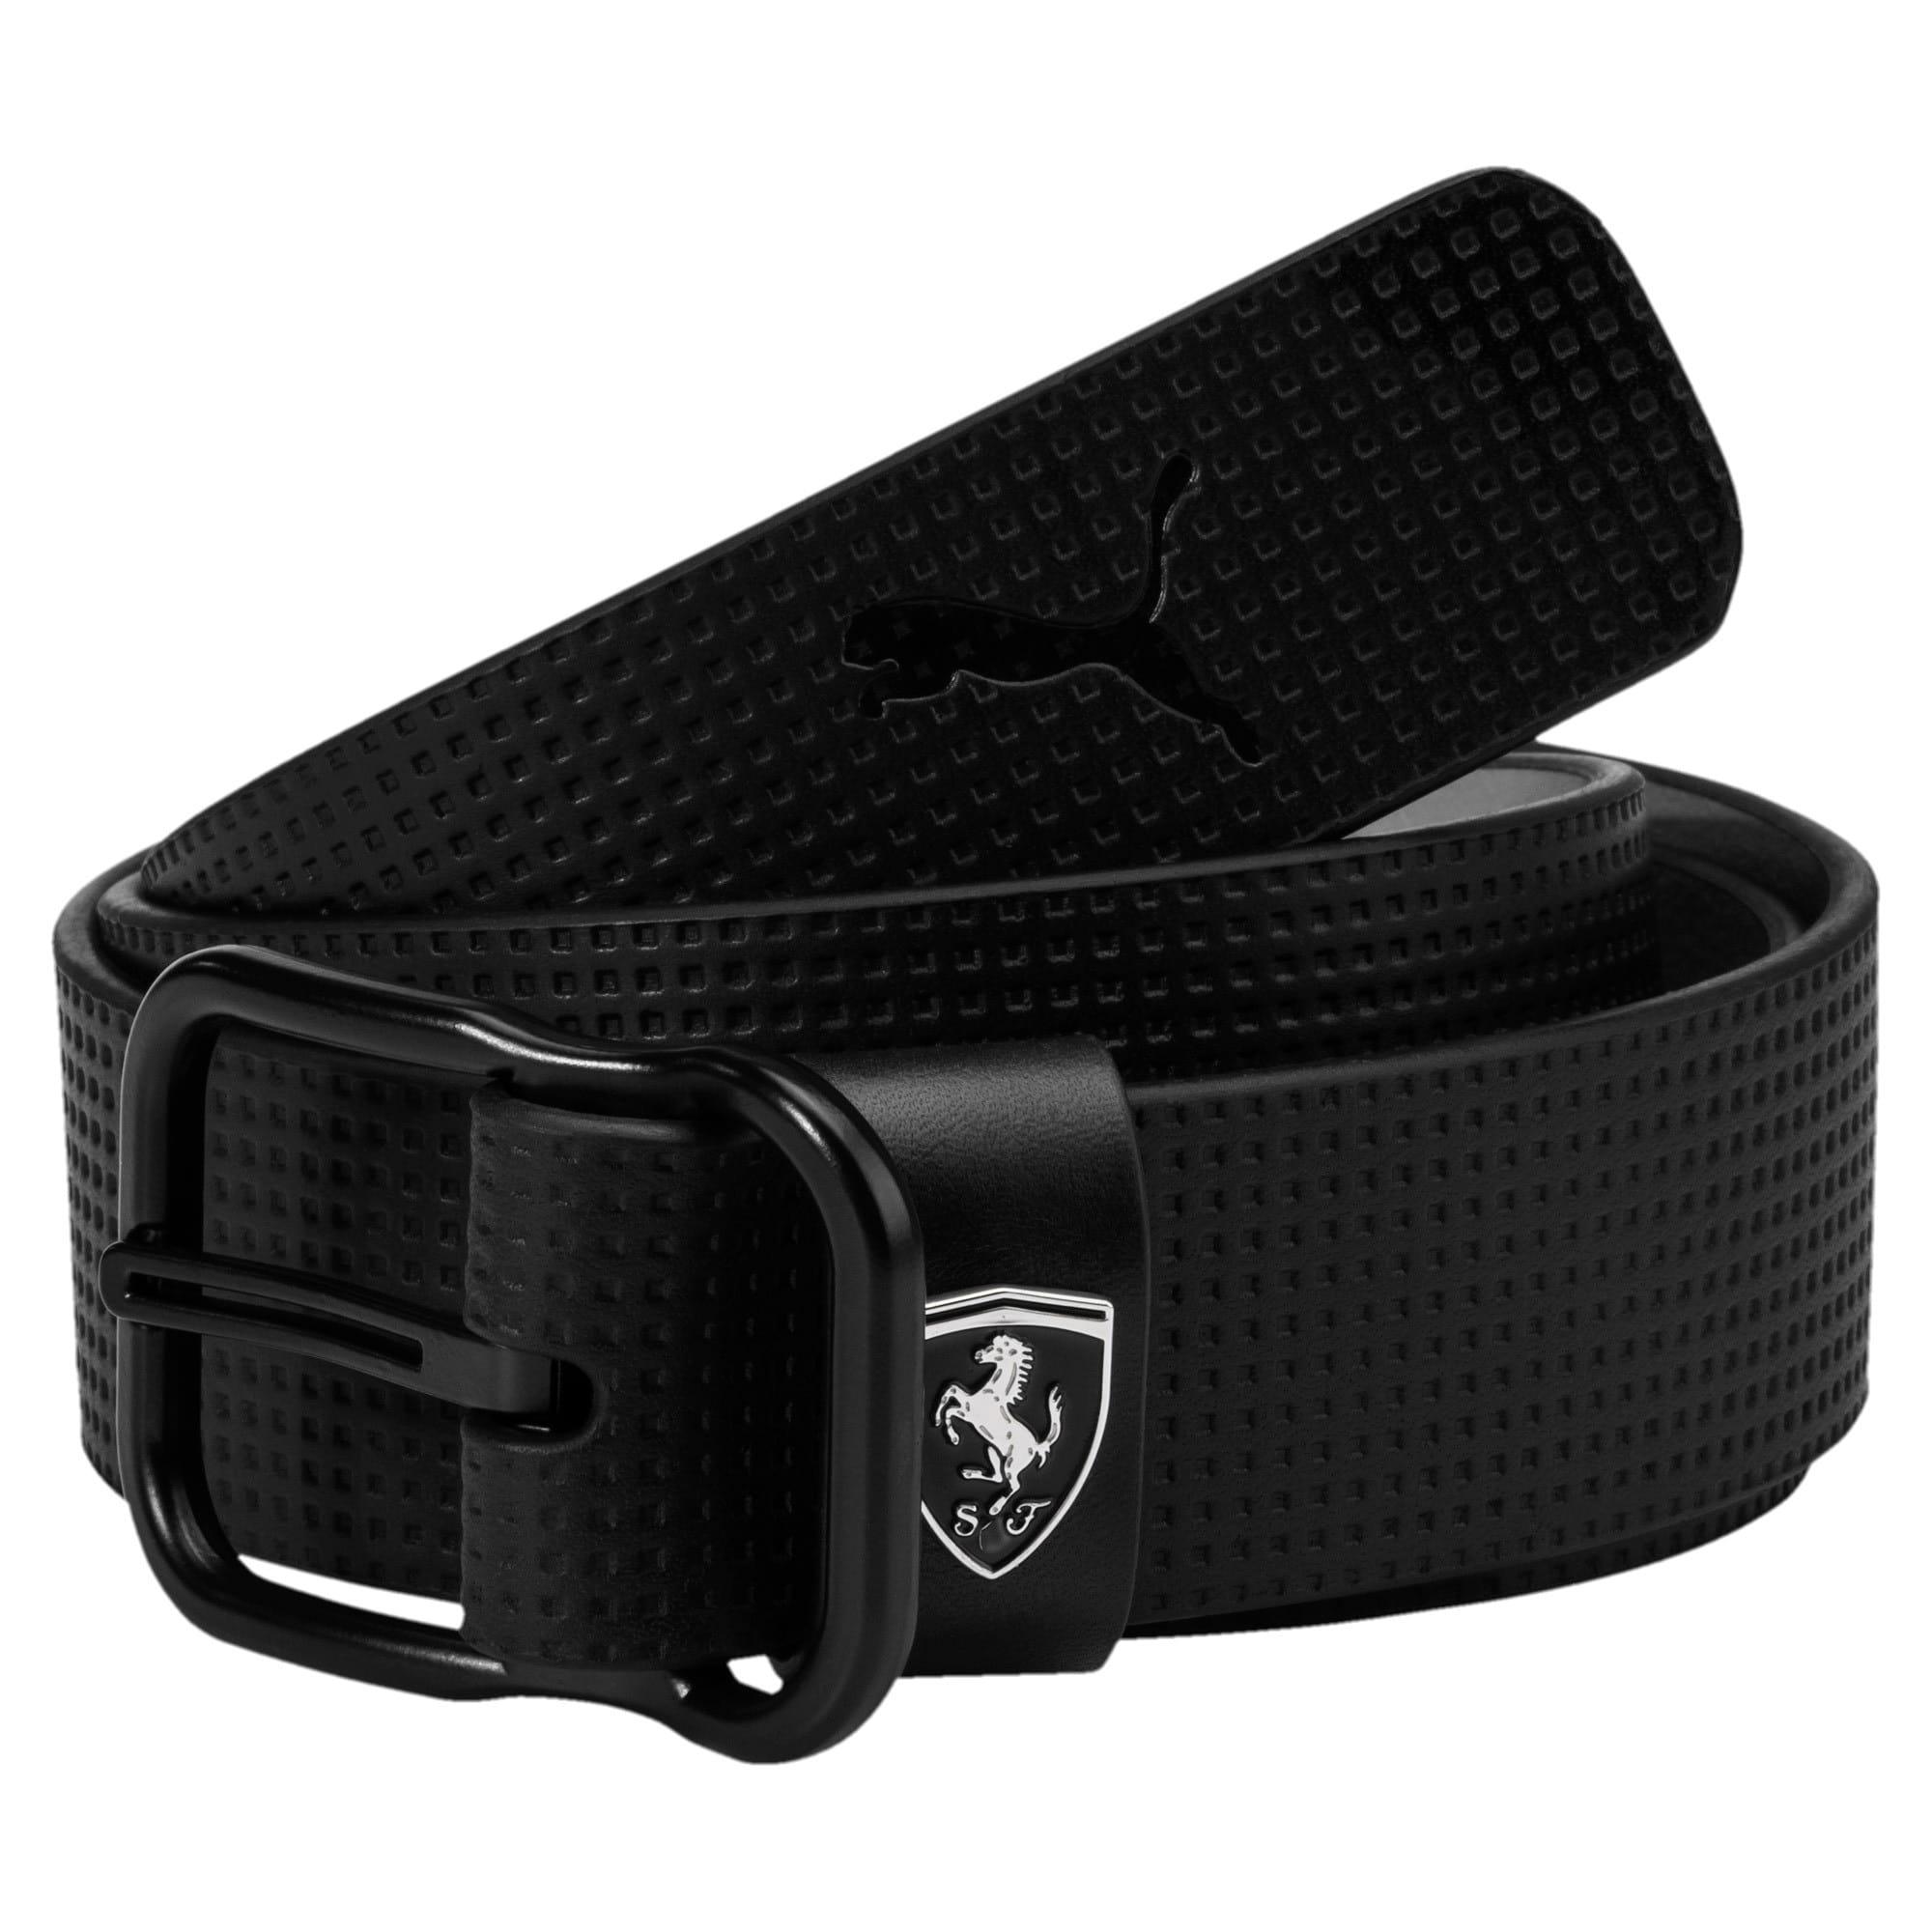 Thumbnail 1 of Ferrari Leather Belt, Puma Black, medium-IND